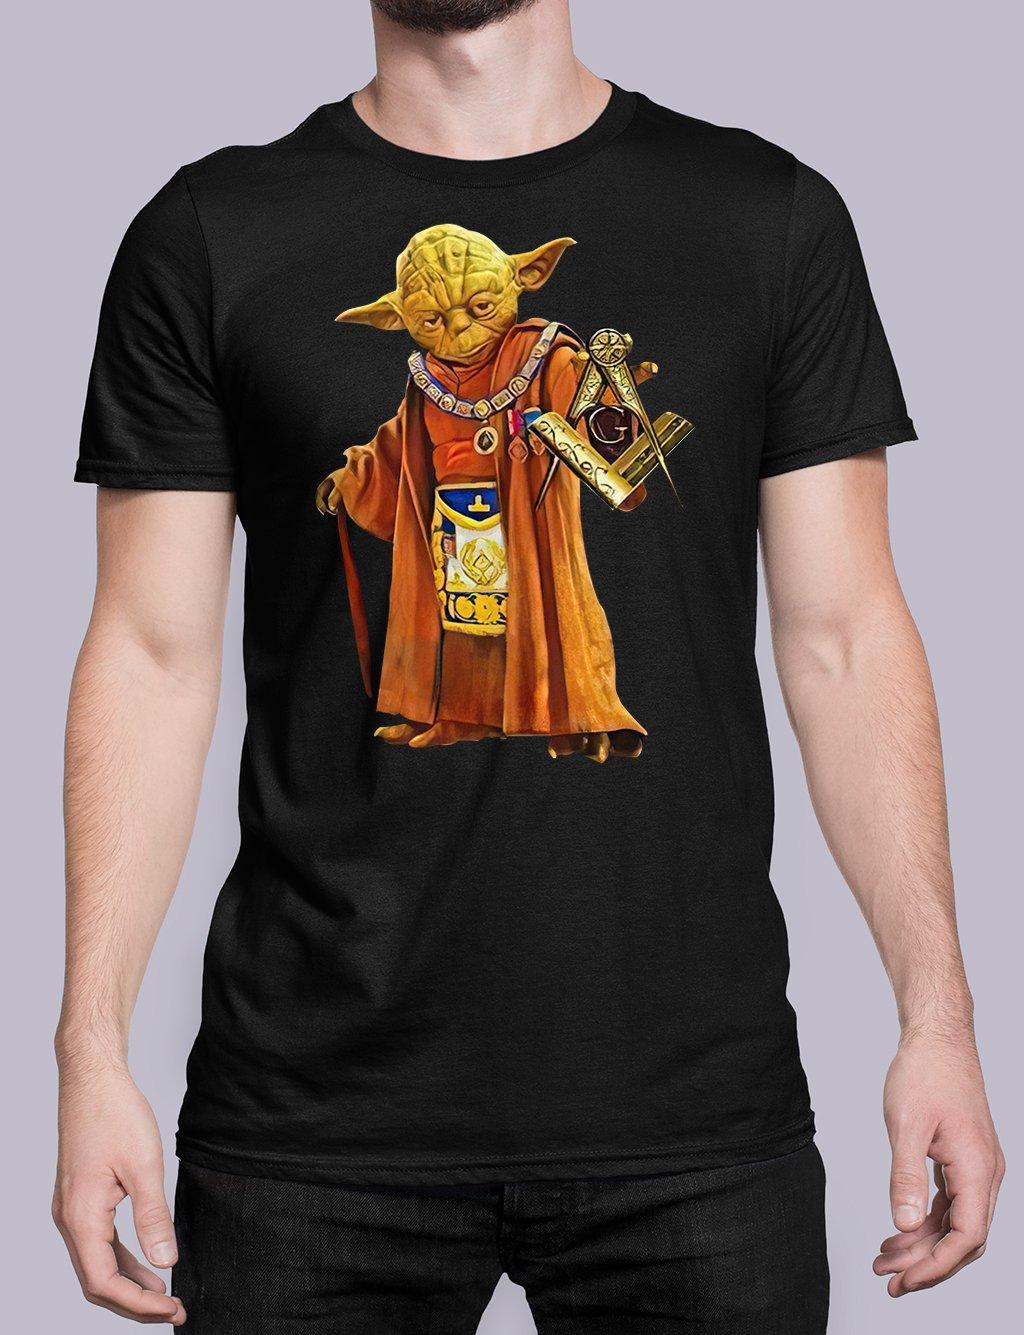 Master Yoda black shirt 25